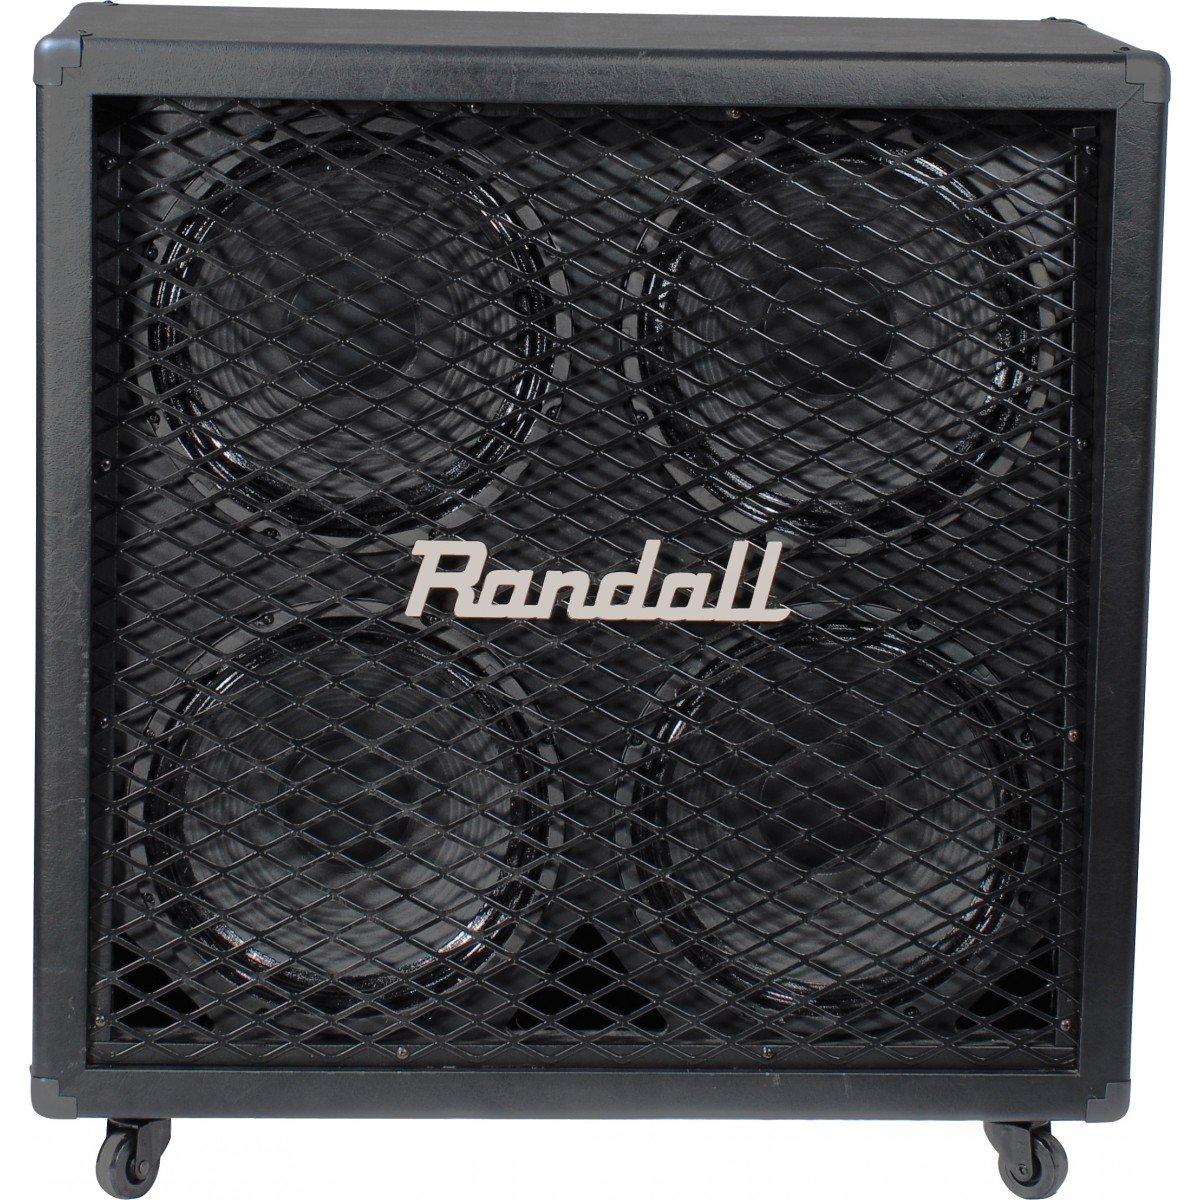 Randall RD412-D Diavlo Series Cabinet by Randall